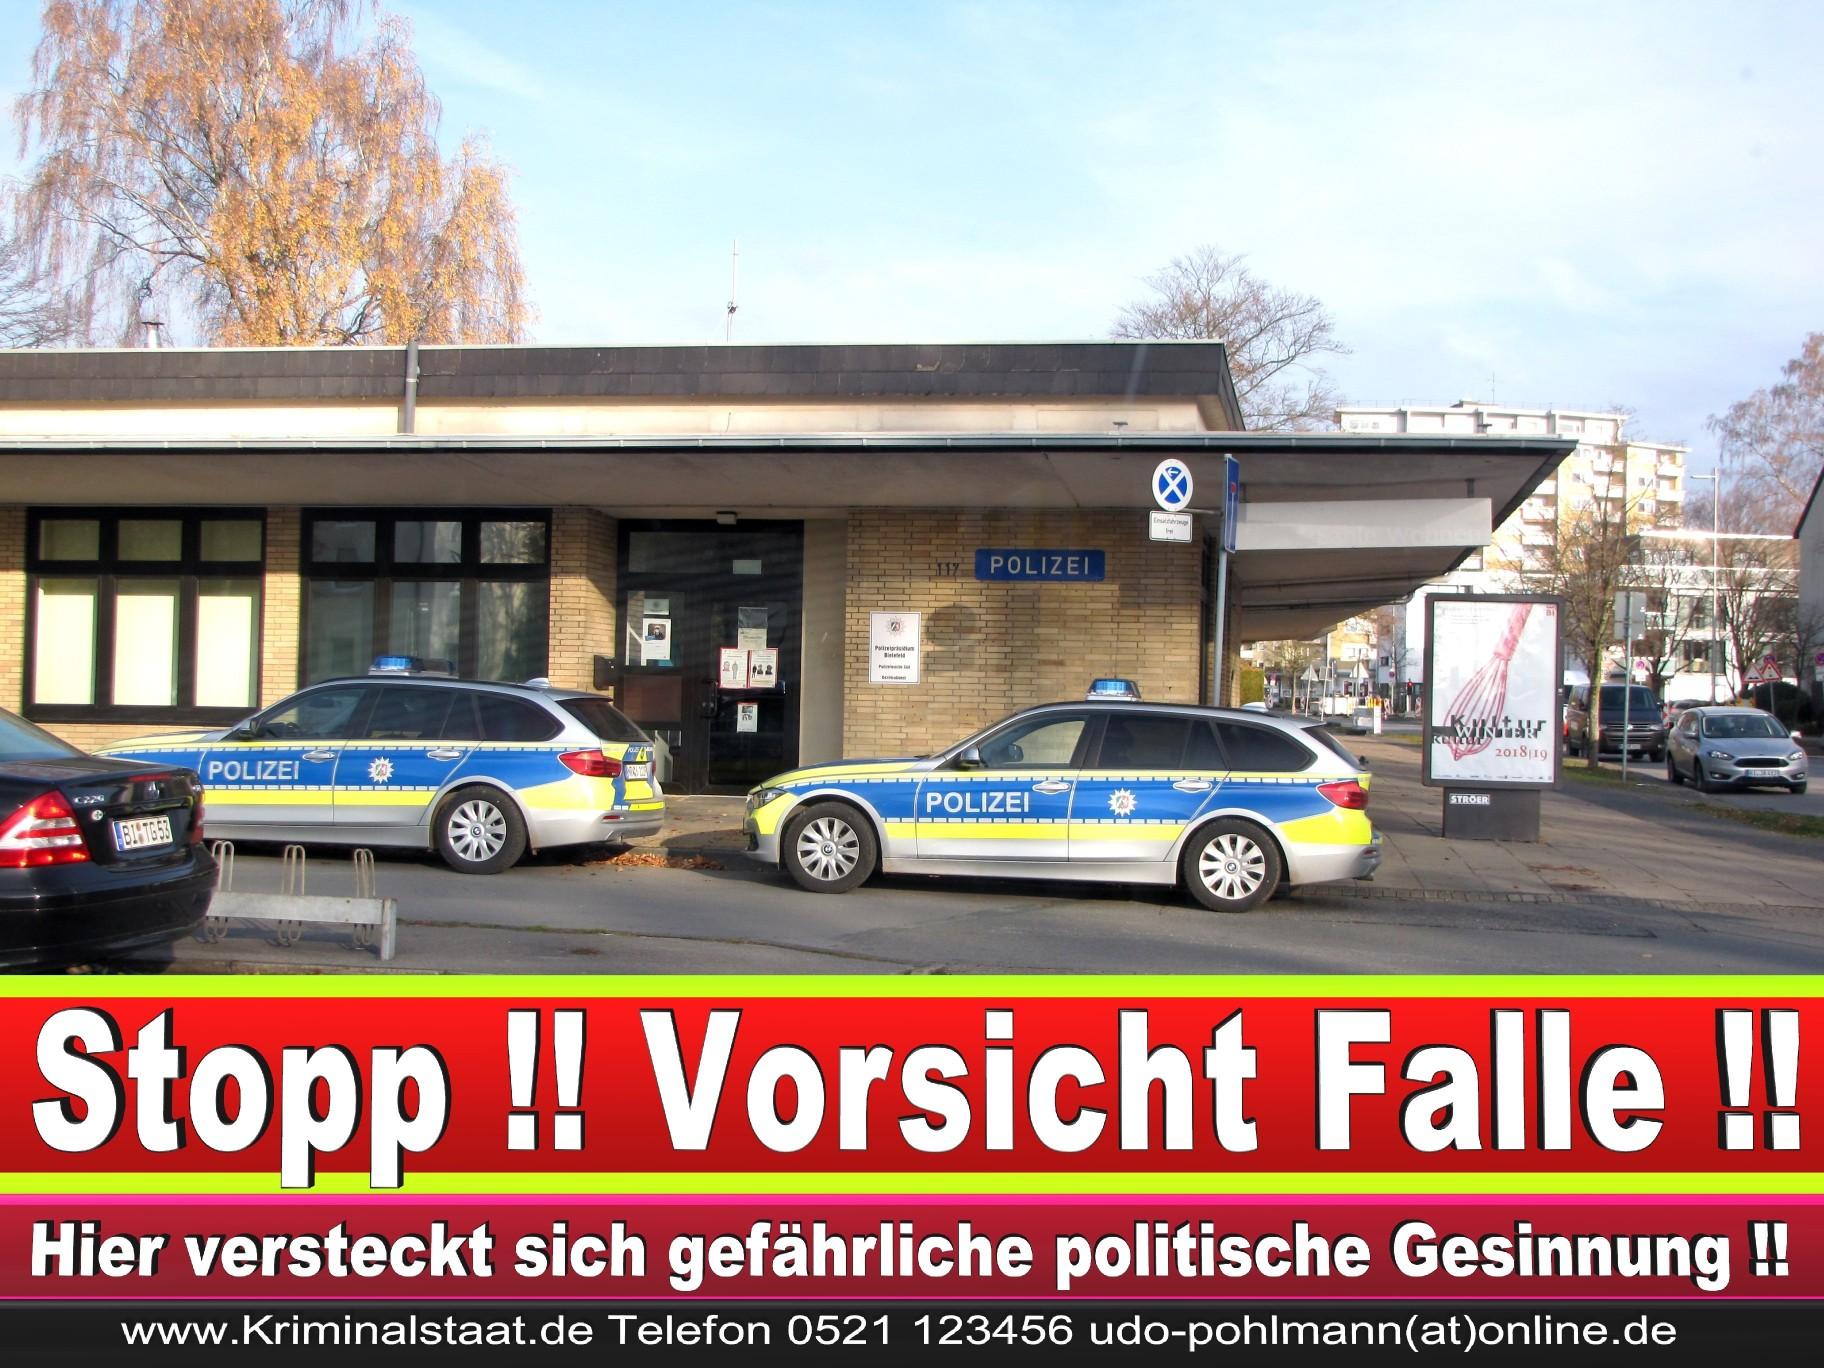 Polizei Bielefeld Sennestadt Günter Vullhorst Korruption Öko Tech Park 17 07 (2)